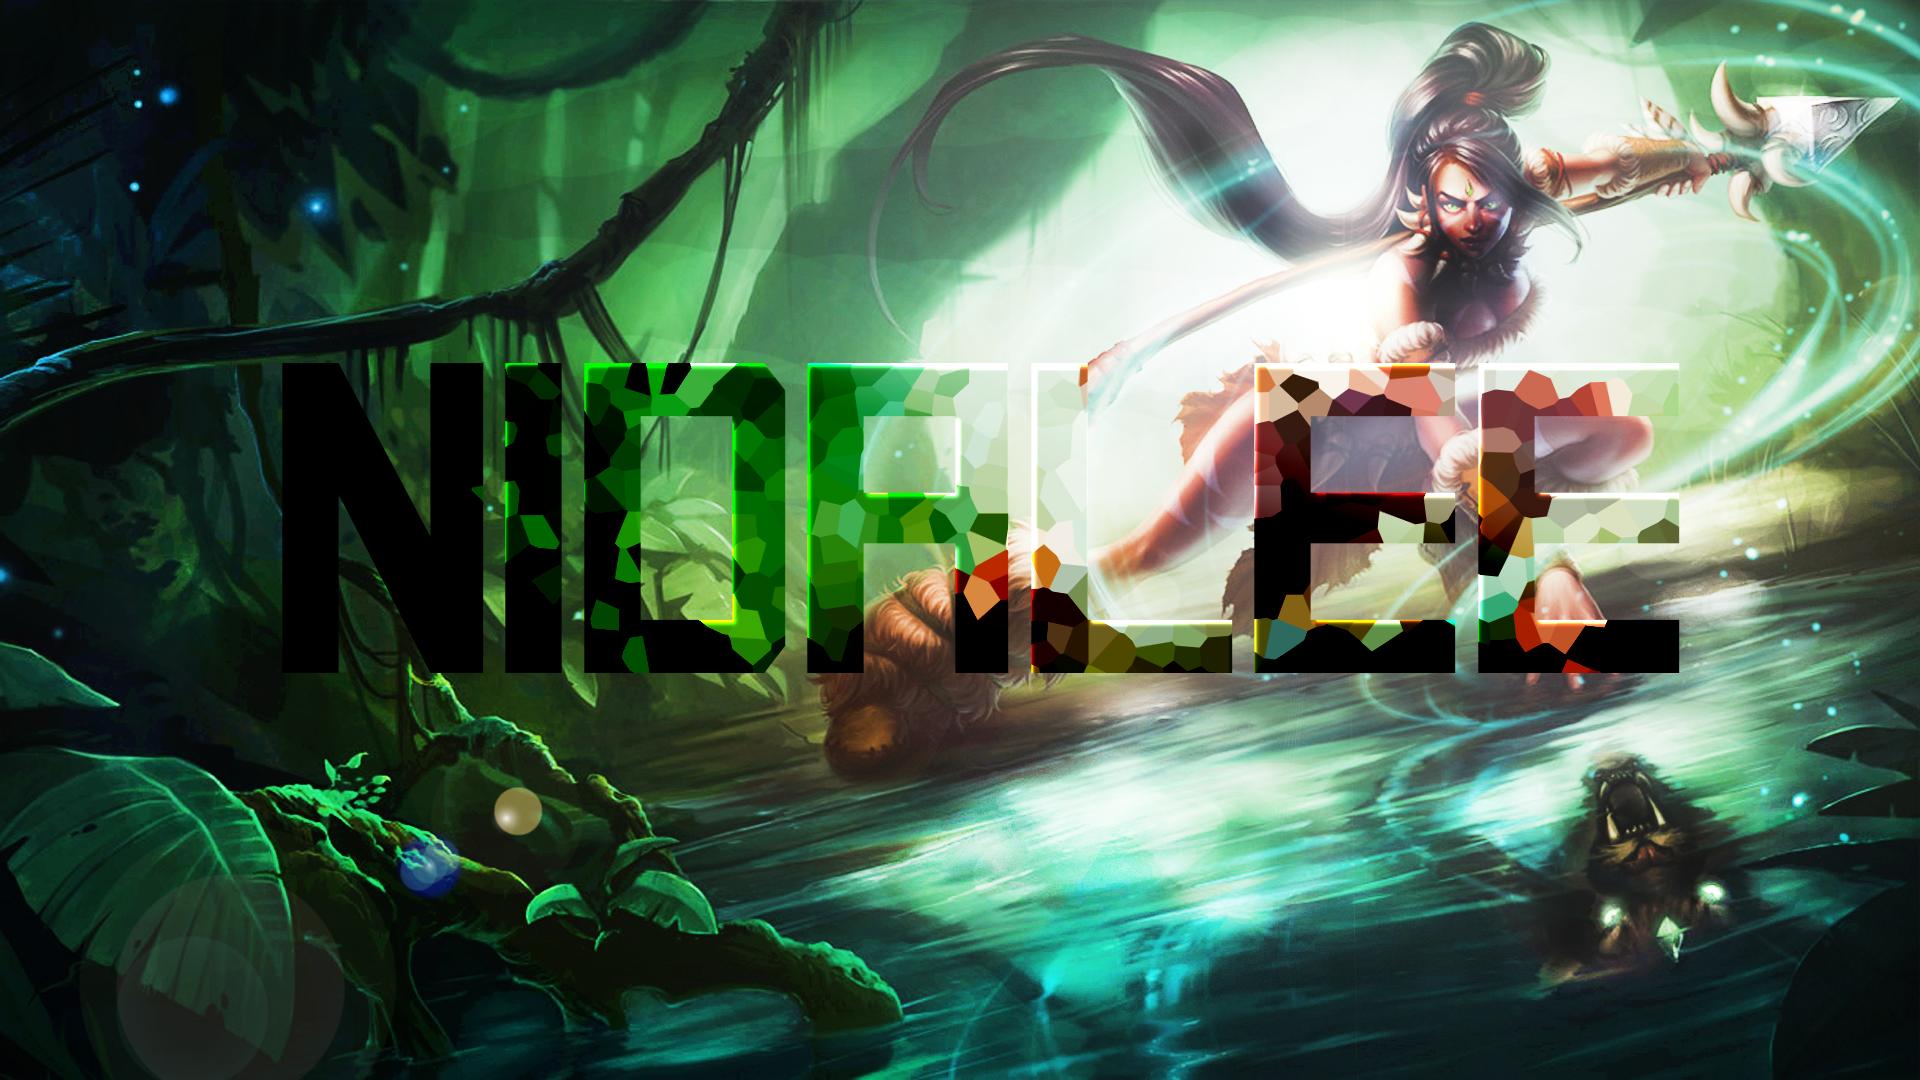 League Of Legends Nidalee Wallpaper By Nipplesplitter On Deviantart